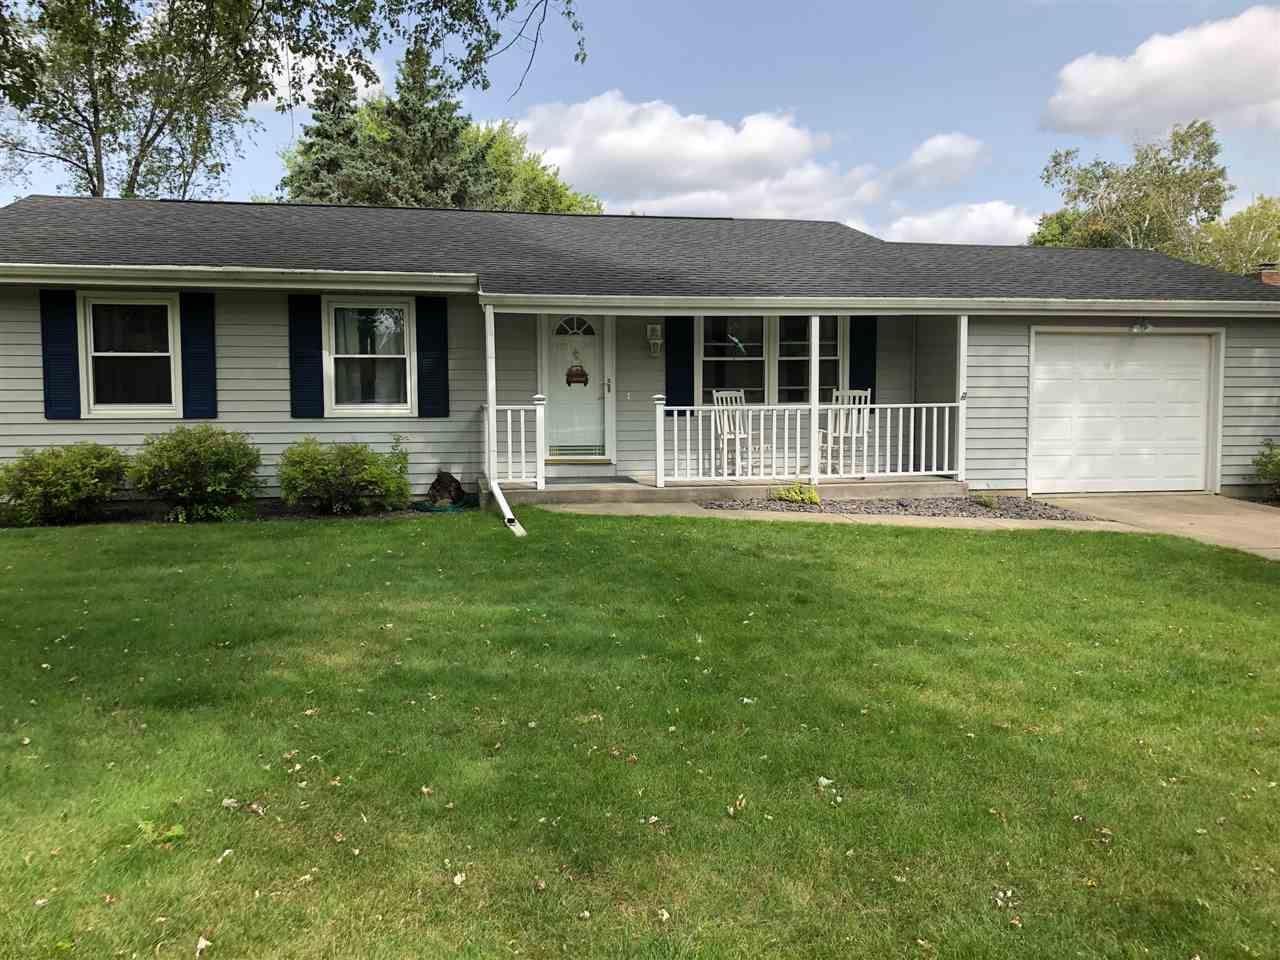 102 Homestead Rd, Milton, WI 53563 - #: 1893746